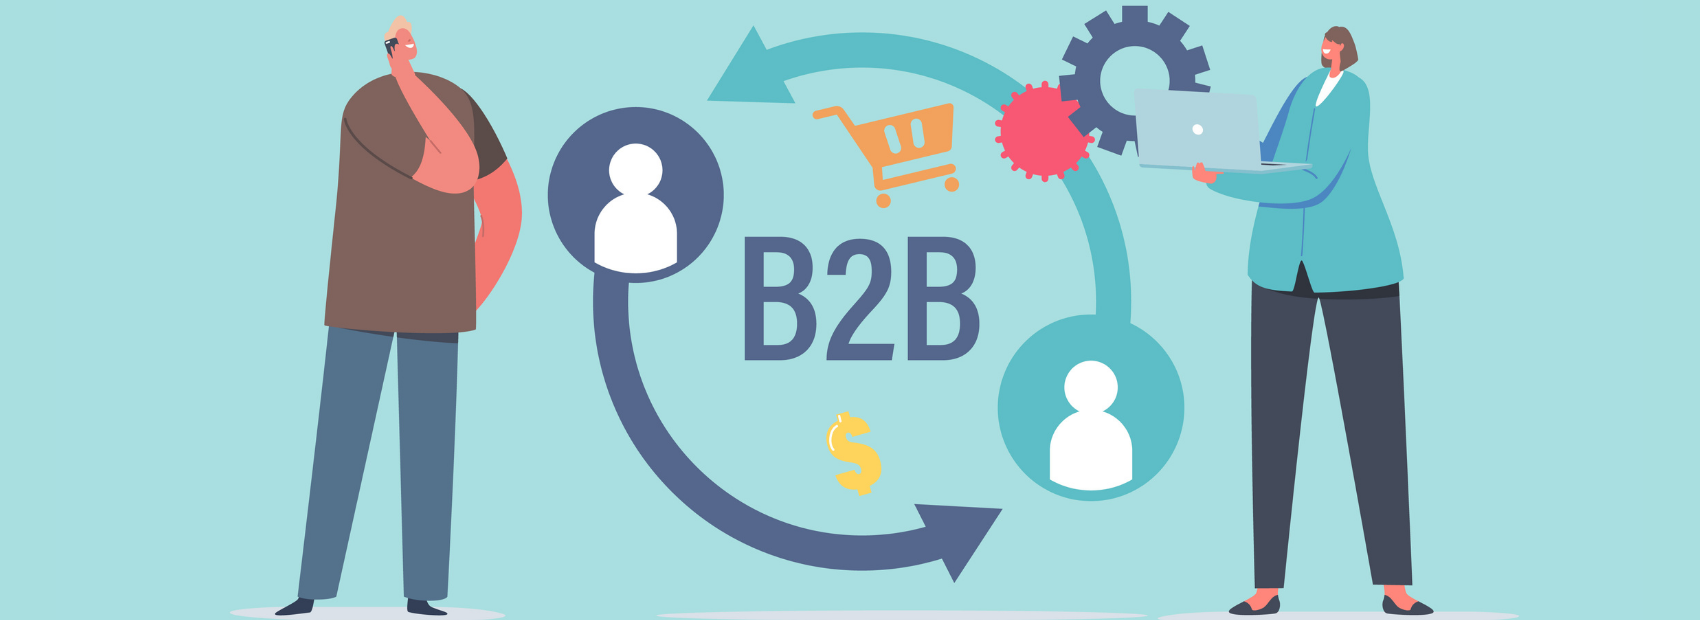 Lead generation: 3 consigli per una strategia B2B